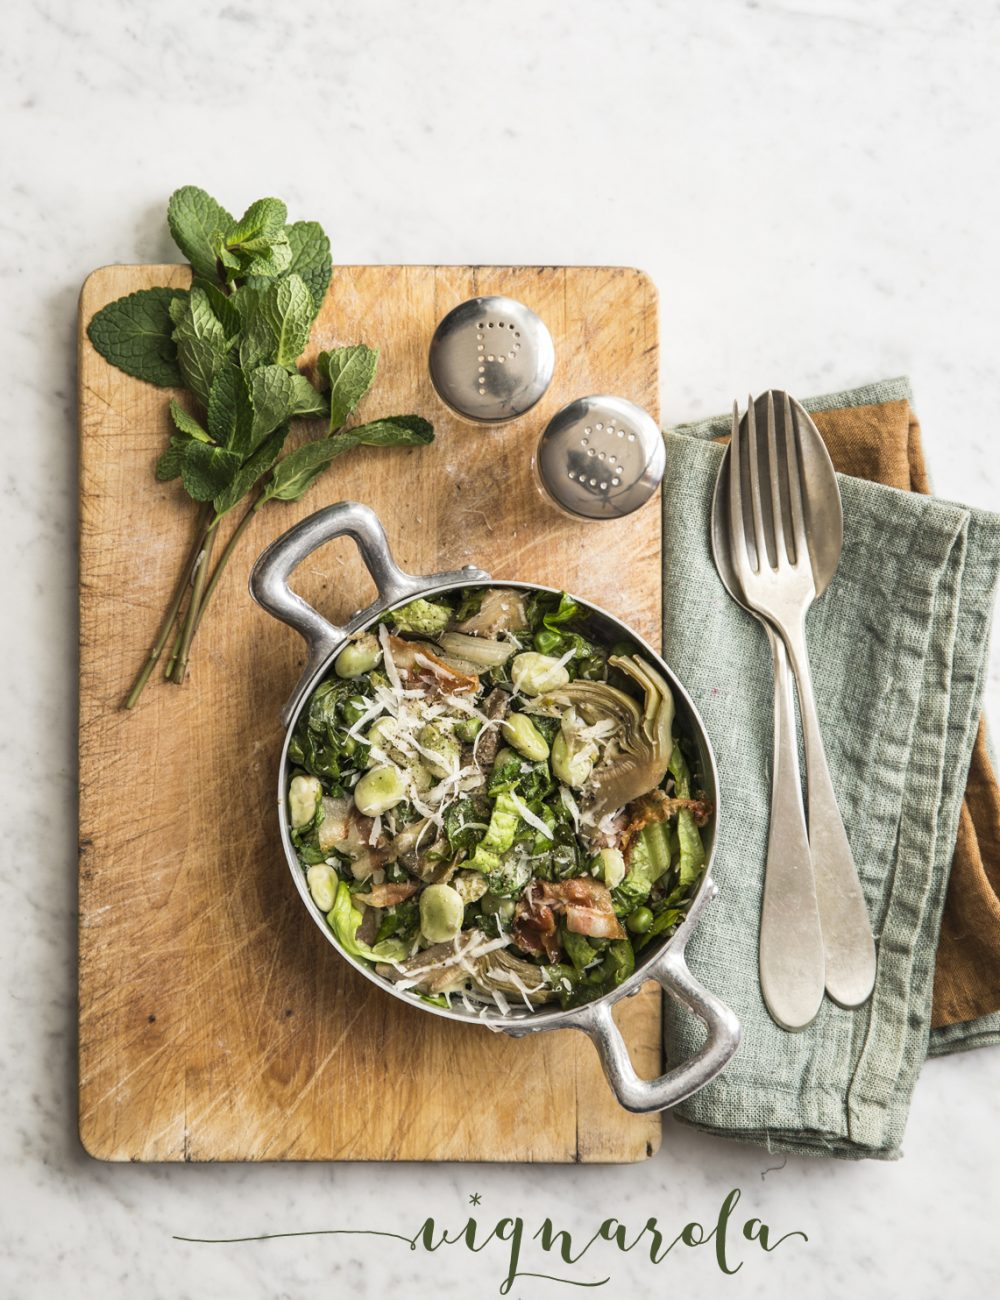 Vignarola - Vaniglia Storie di Cucina